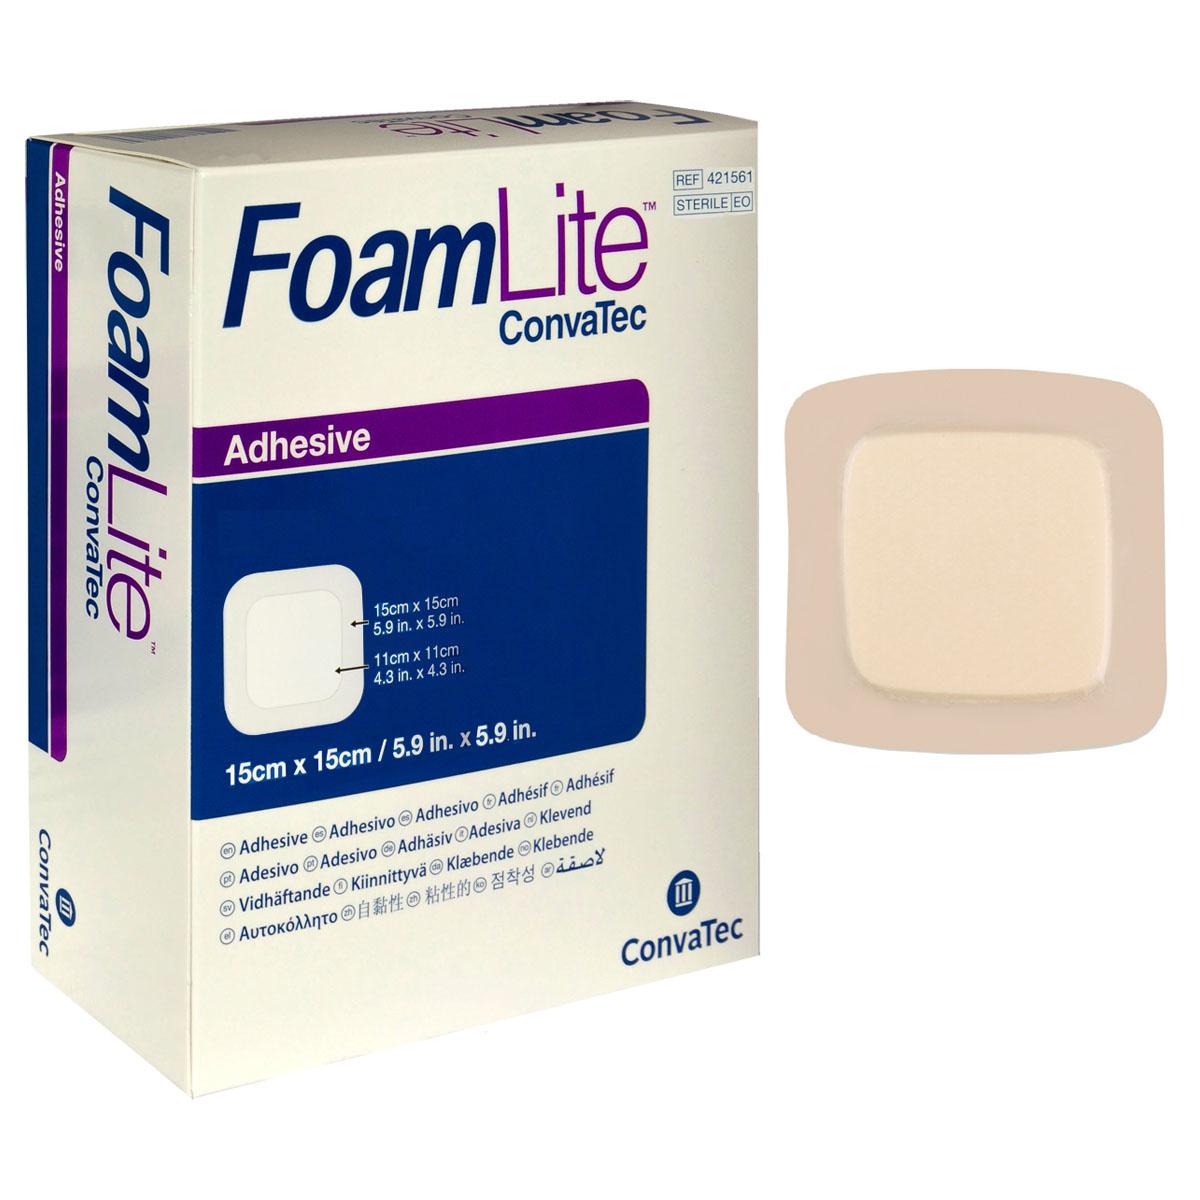 "FoamLite Foam Adhesive Dressing, Square, 6"" x 6"" 51421561"